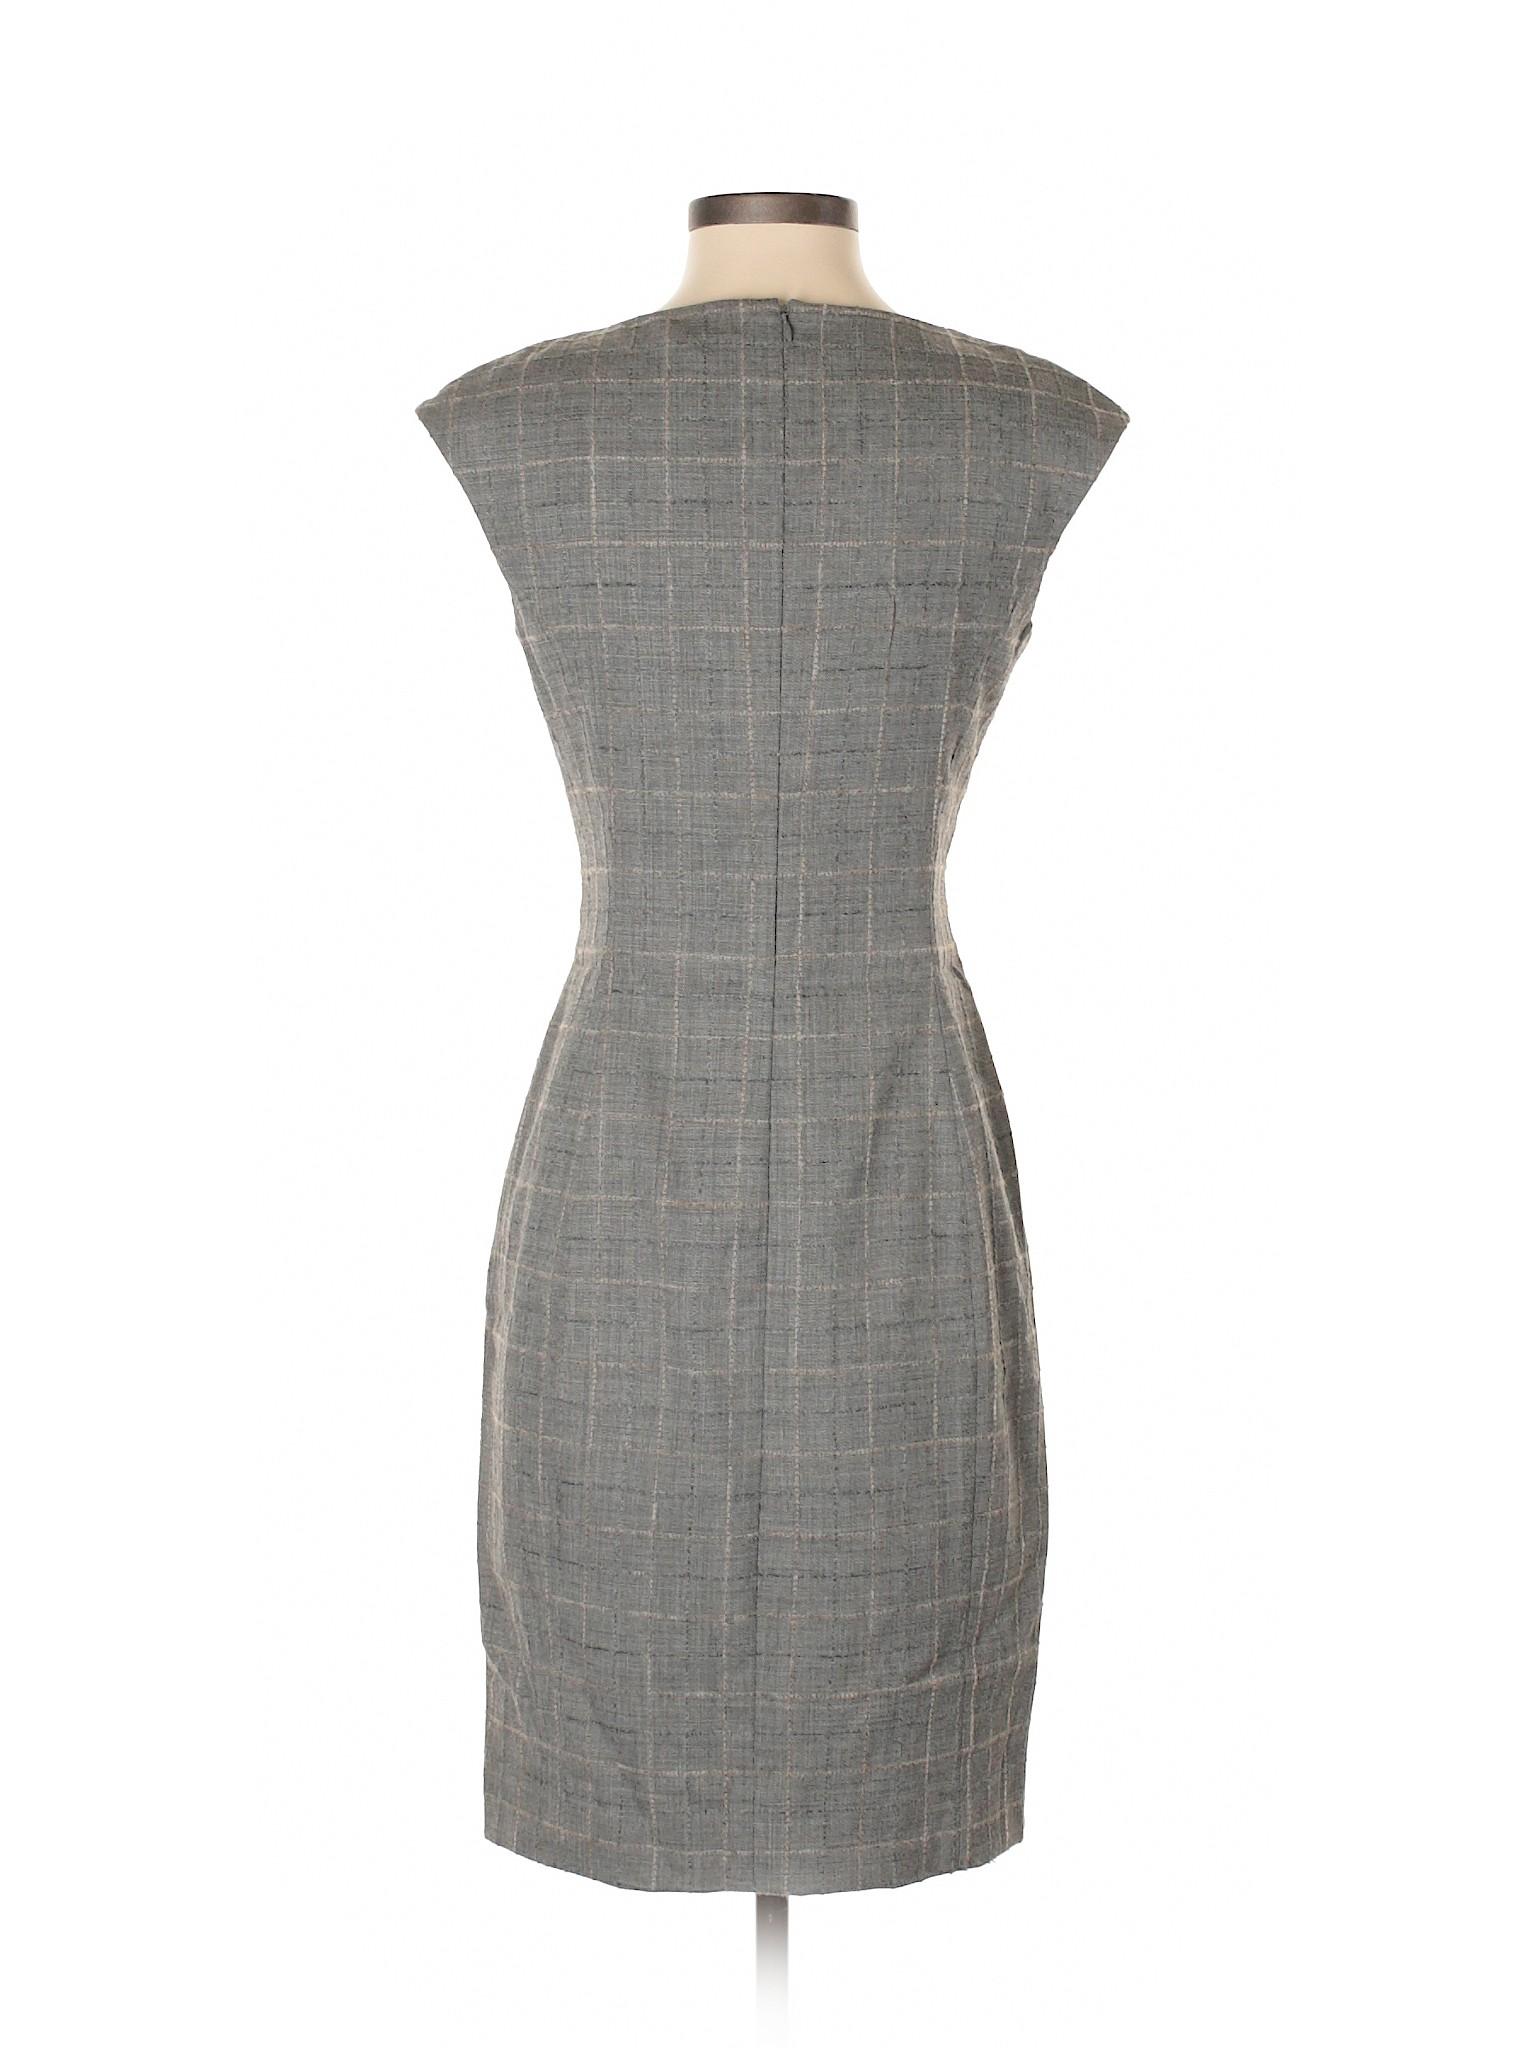 Classiques Classiques Casual Dress Selling Selling Dress Casual Entier Classiques Entier Entier Selling AwYn6